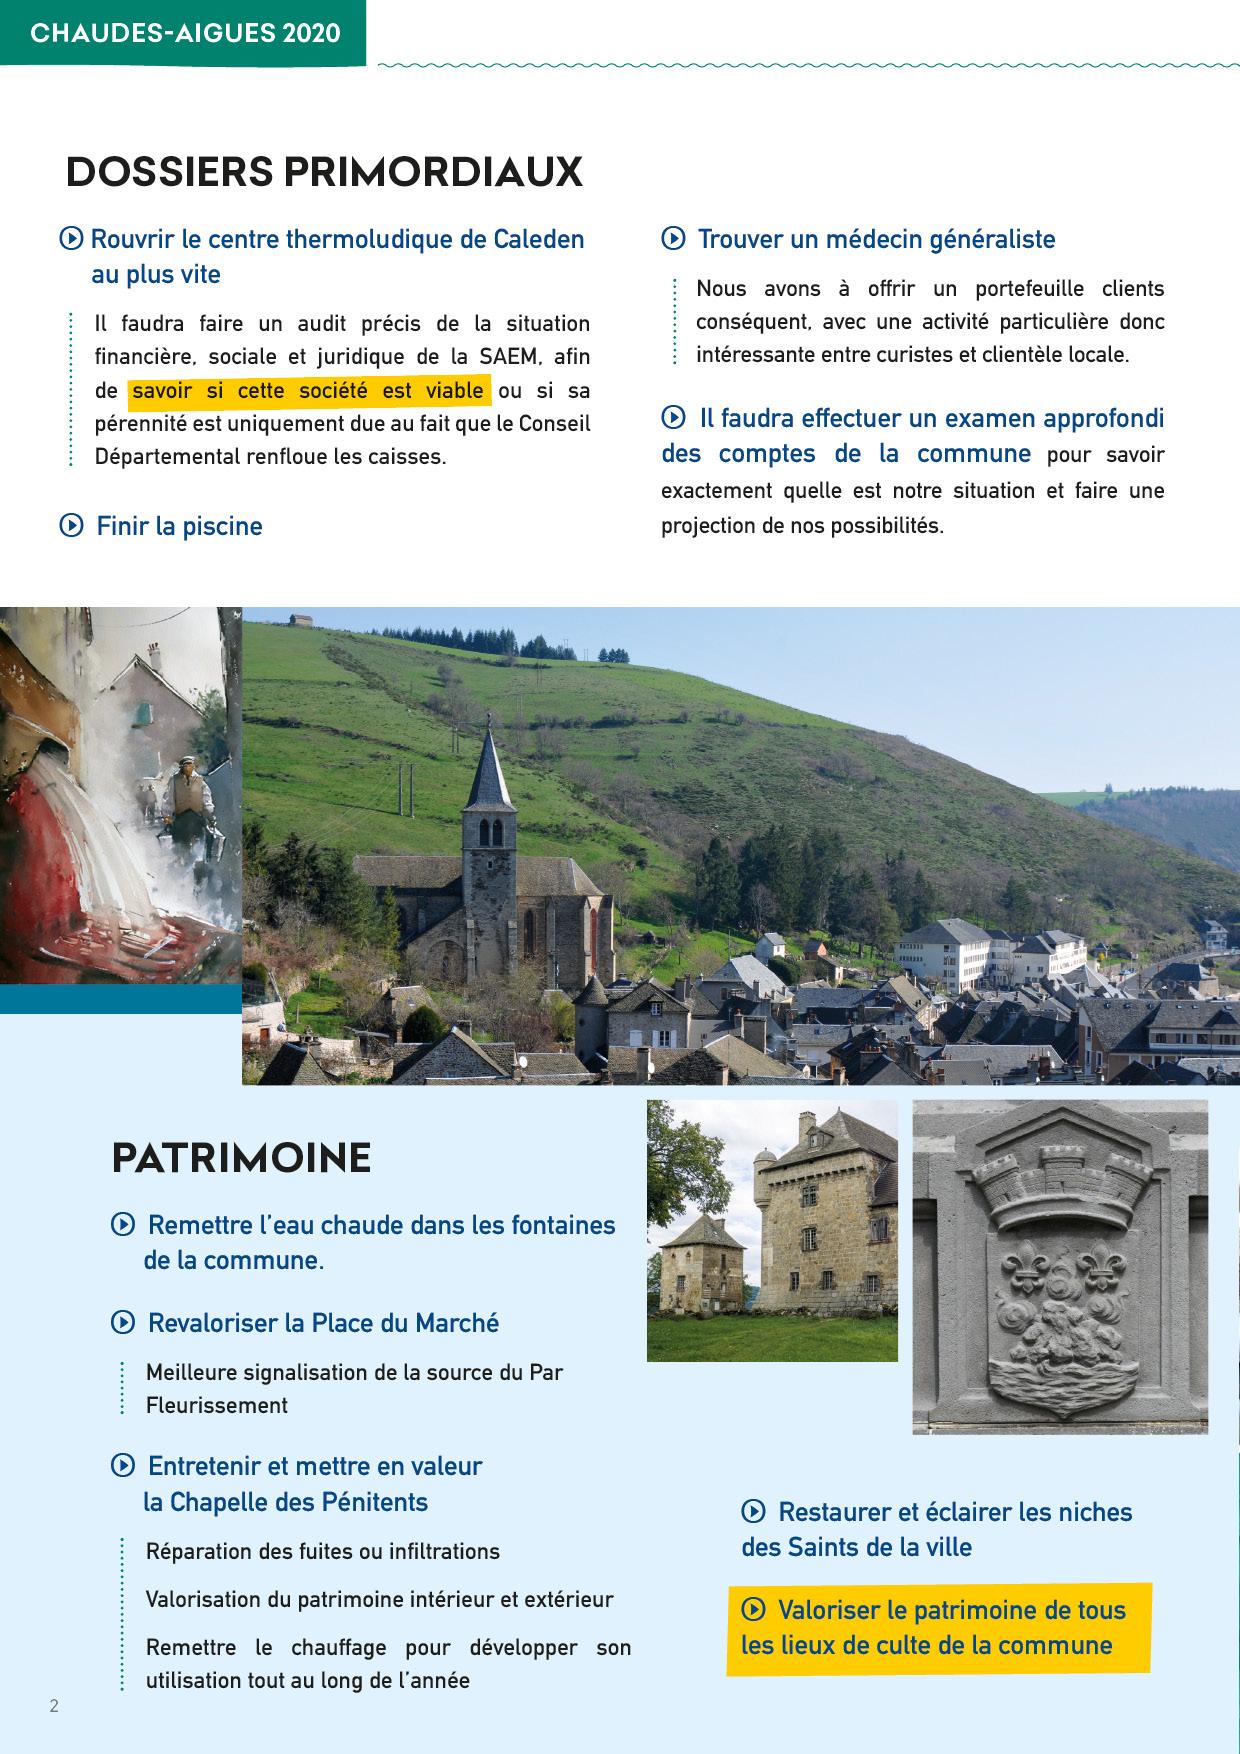 mairie-chaudes-aigues-maire-stephane-chaudesaigues-programme